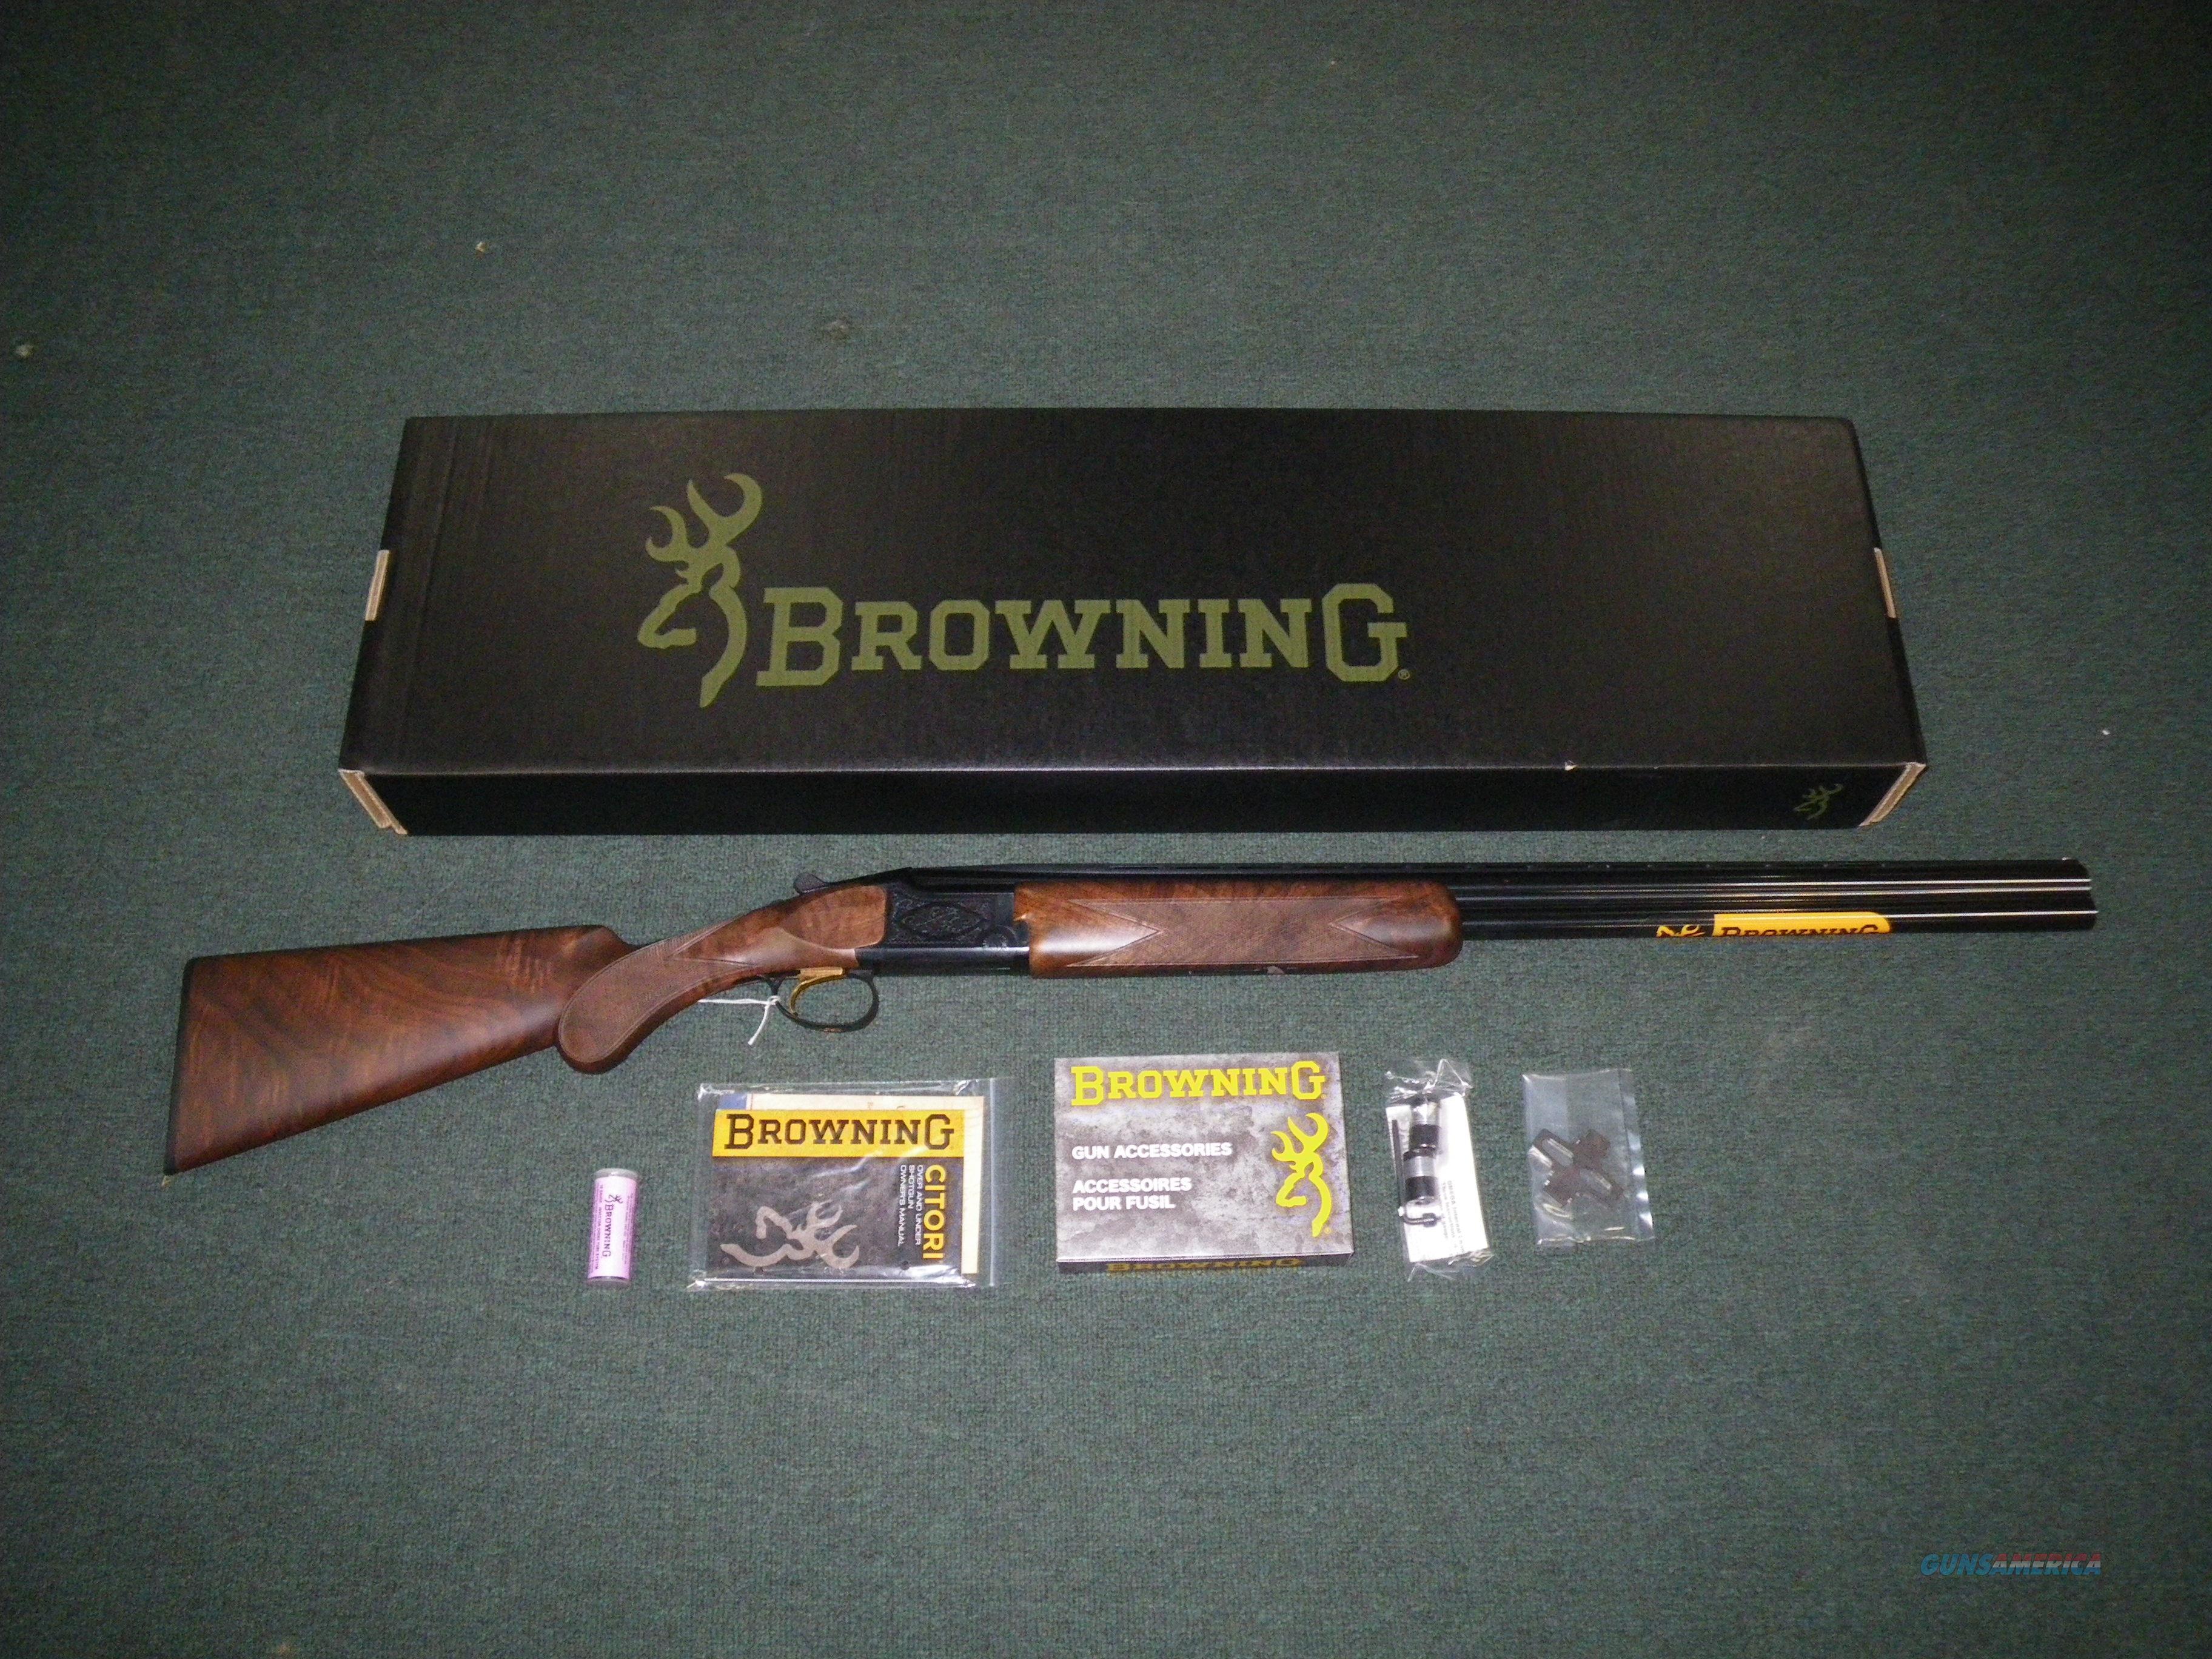 "Browning Citori Grand Lightning 16ga 26"" 2 3/4"" chmbr #013493514  Guns > Shotguns > Browning Shotguns > Over Unders > Citori > Hunting"